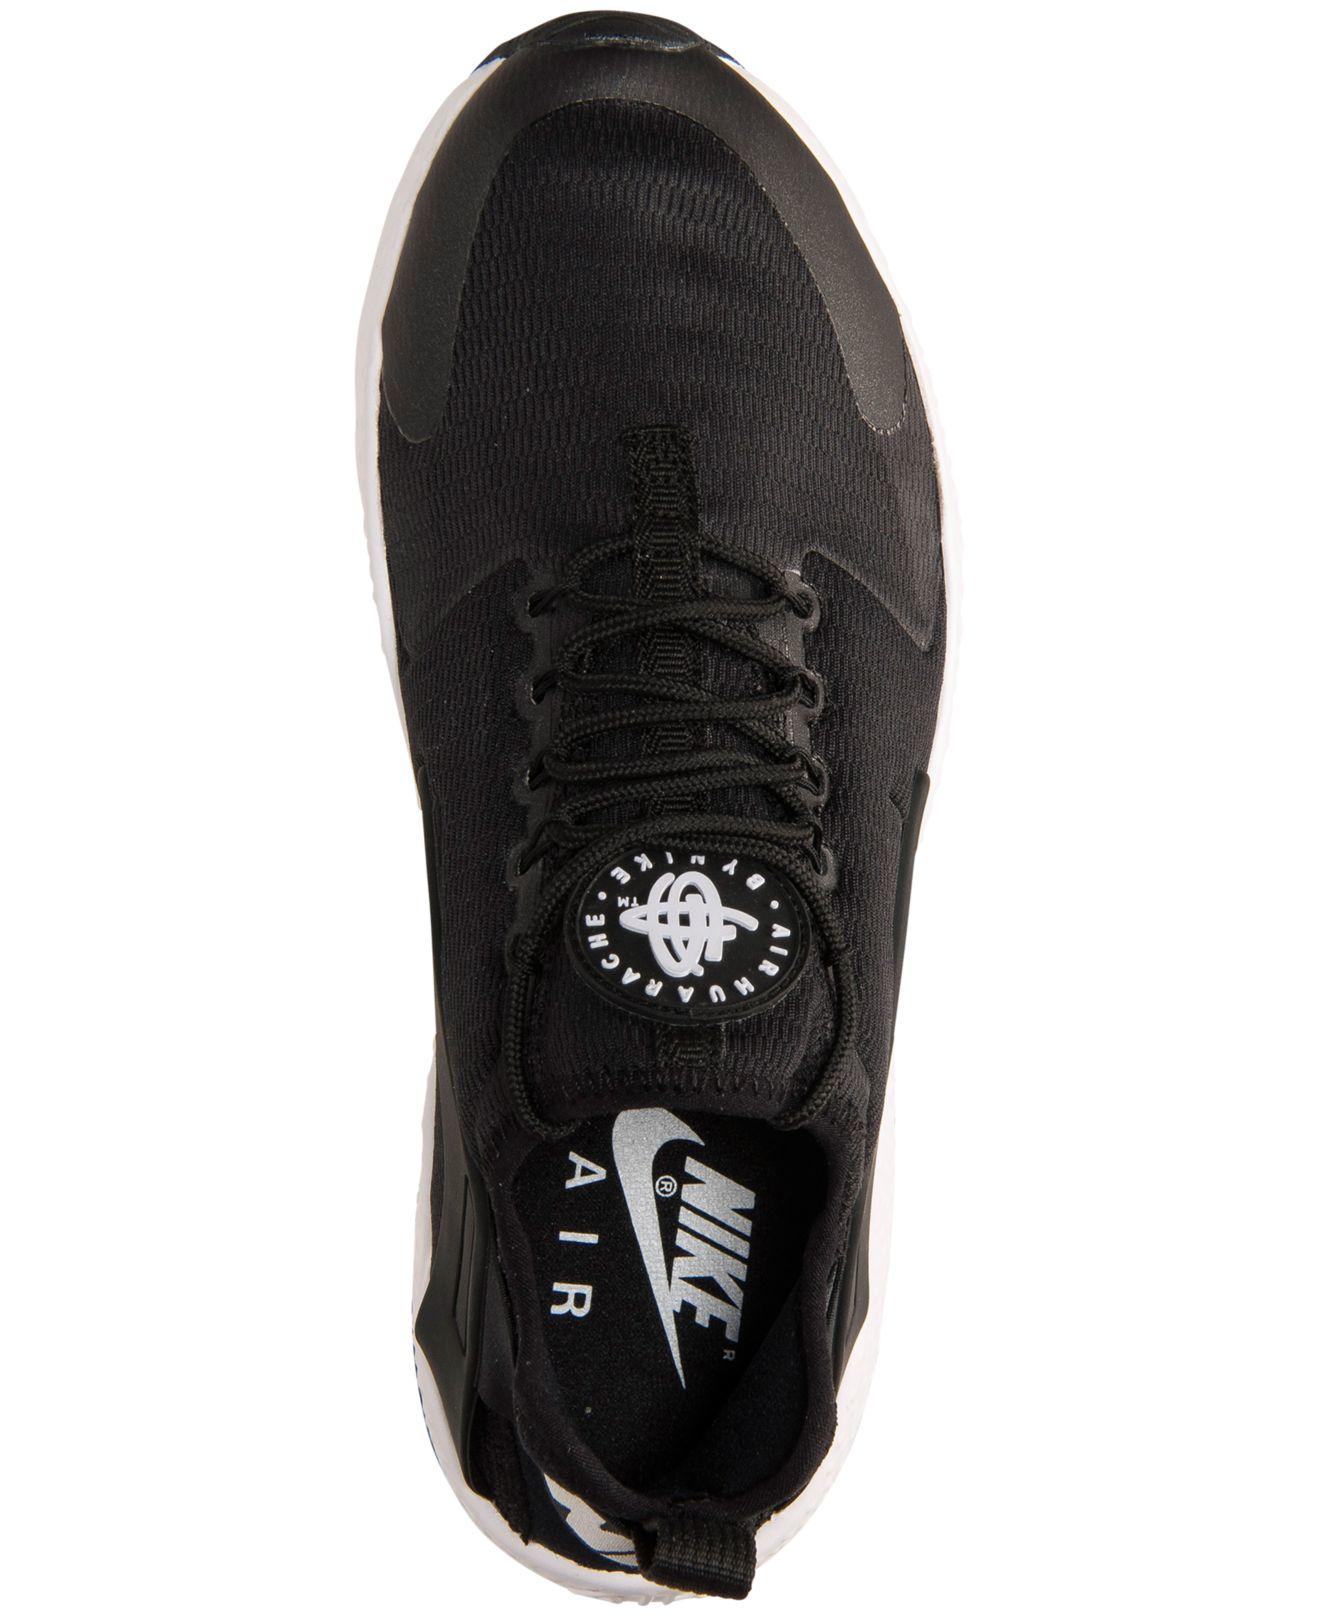 aba2aafbdd41 Lyst - Nike Women s Air Huarache Run Ultra Running Sneakers From ...